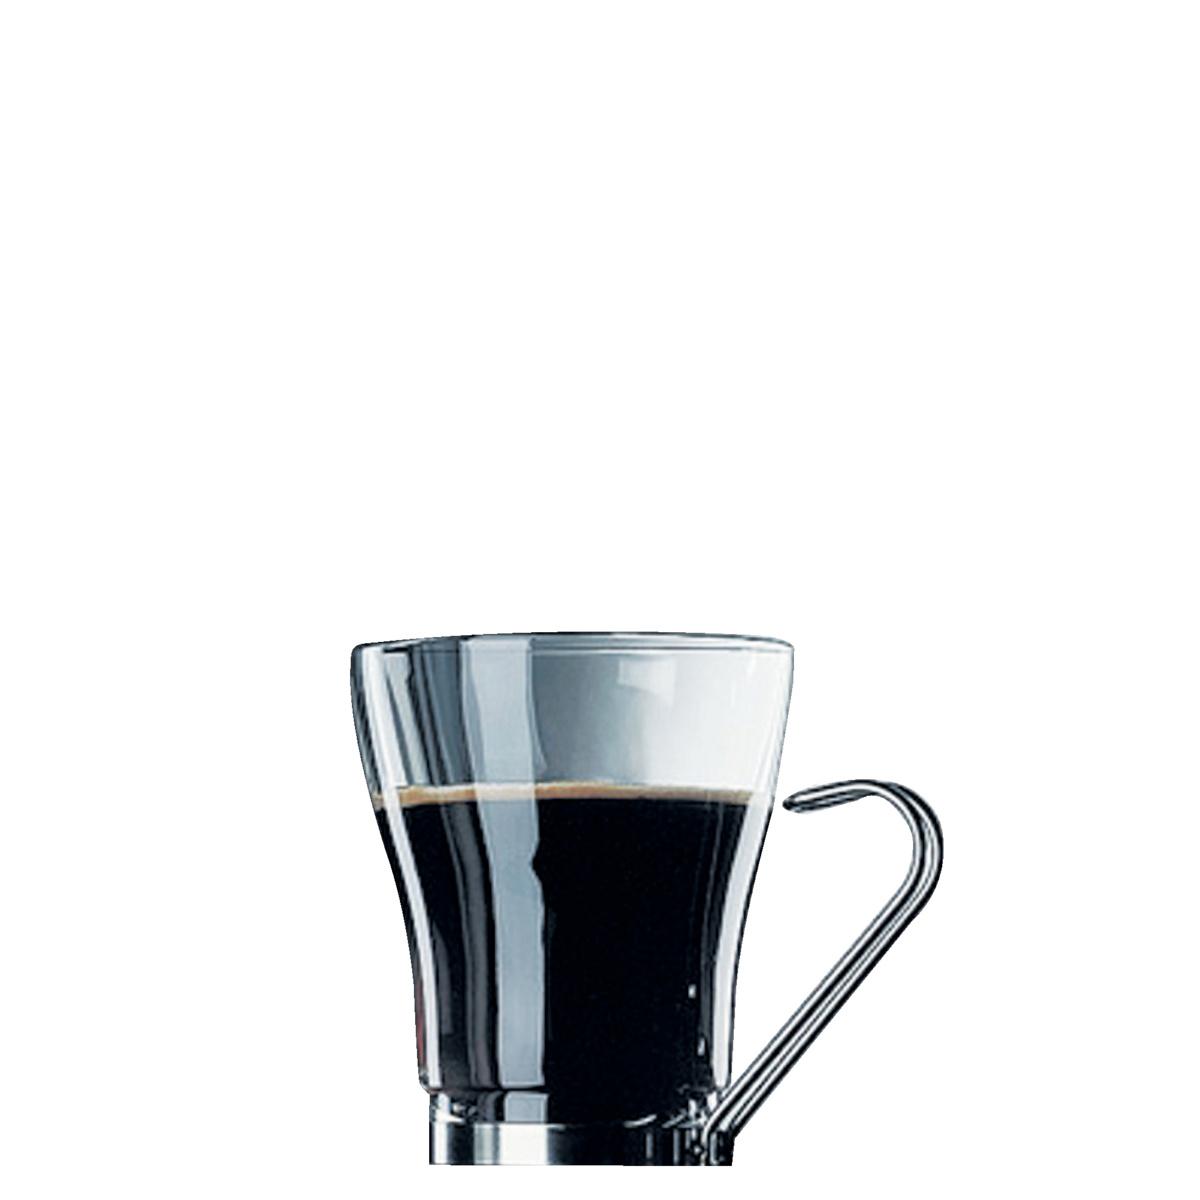 Tasse à cappuccino ronde transparente verre 22 cl Ø 8,20 cm Oslo Punch Bormioli Rocco